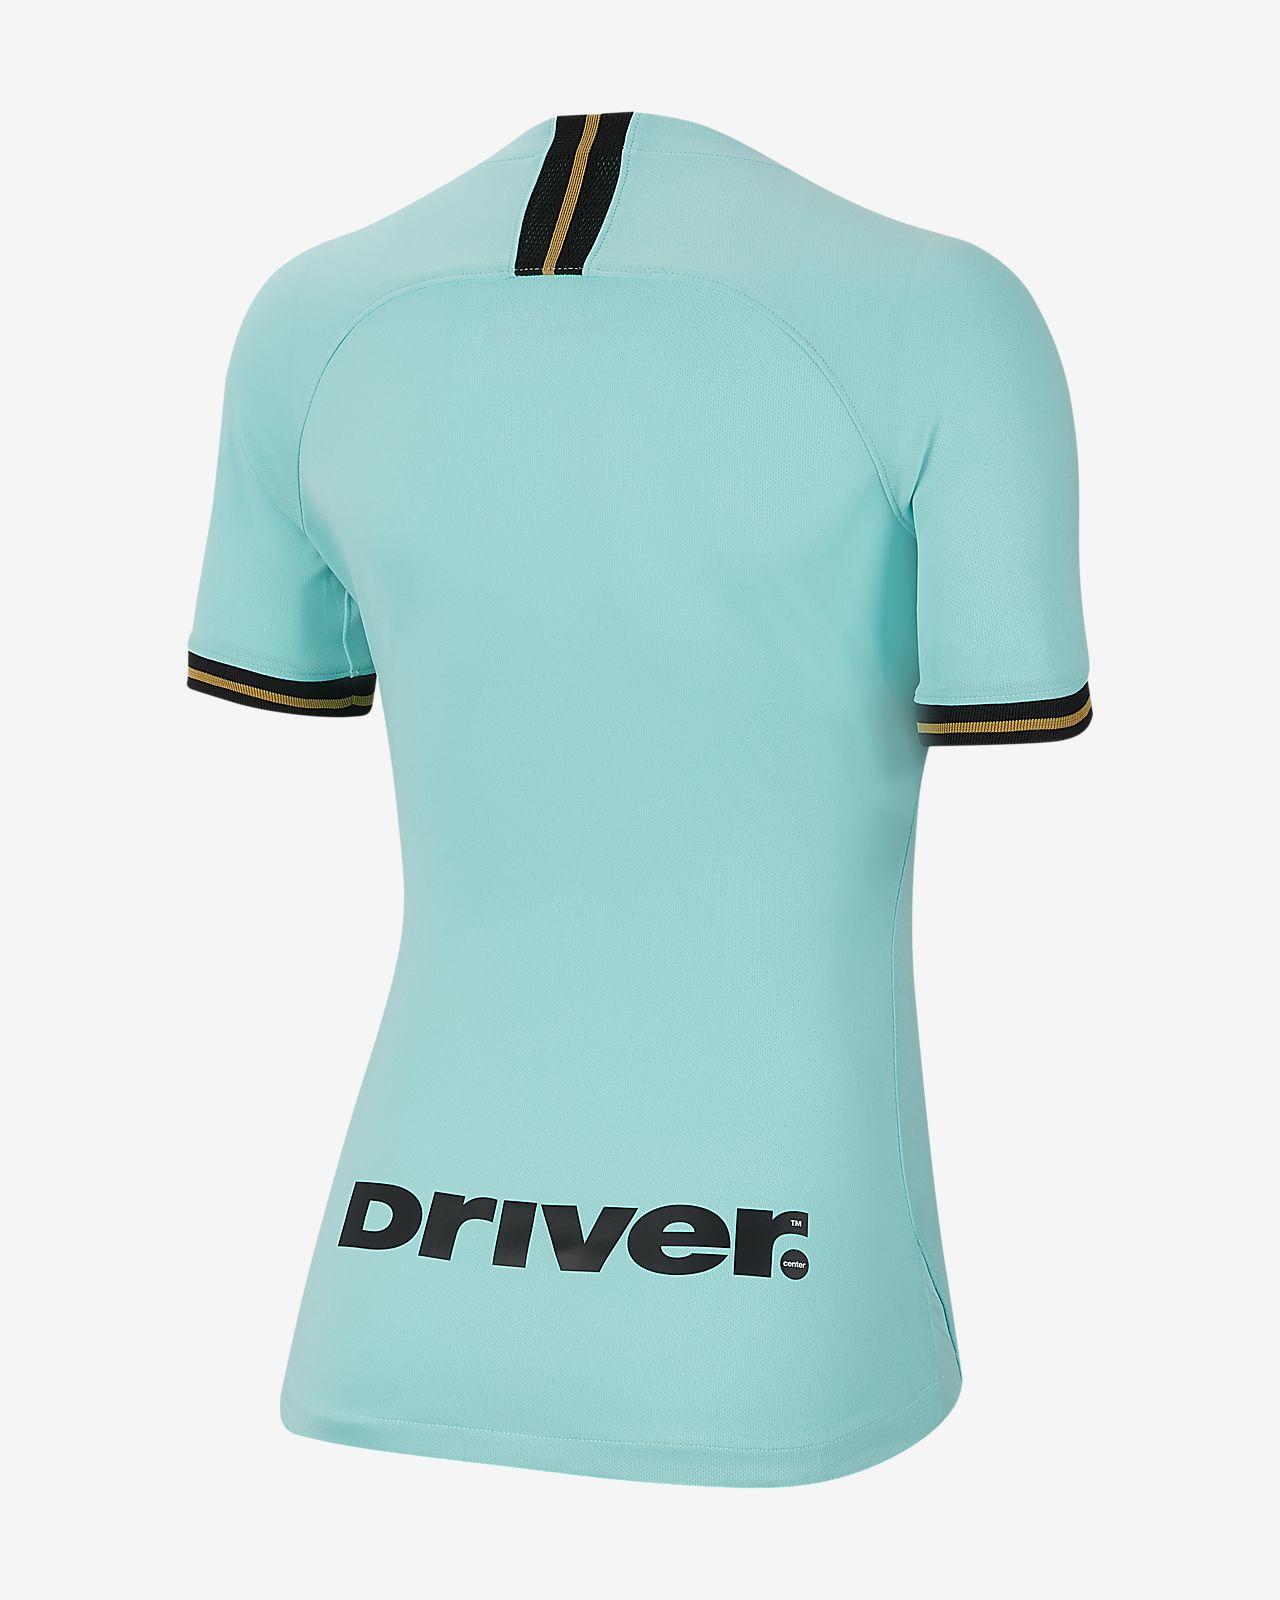 new product 98588 3cc60 Inter Milan 2019/20 Stadium Away Women's Football Shirt